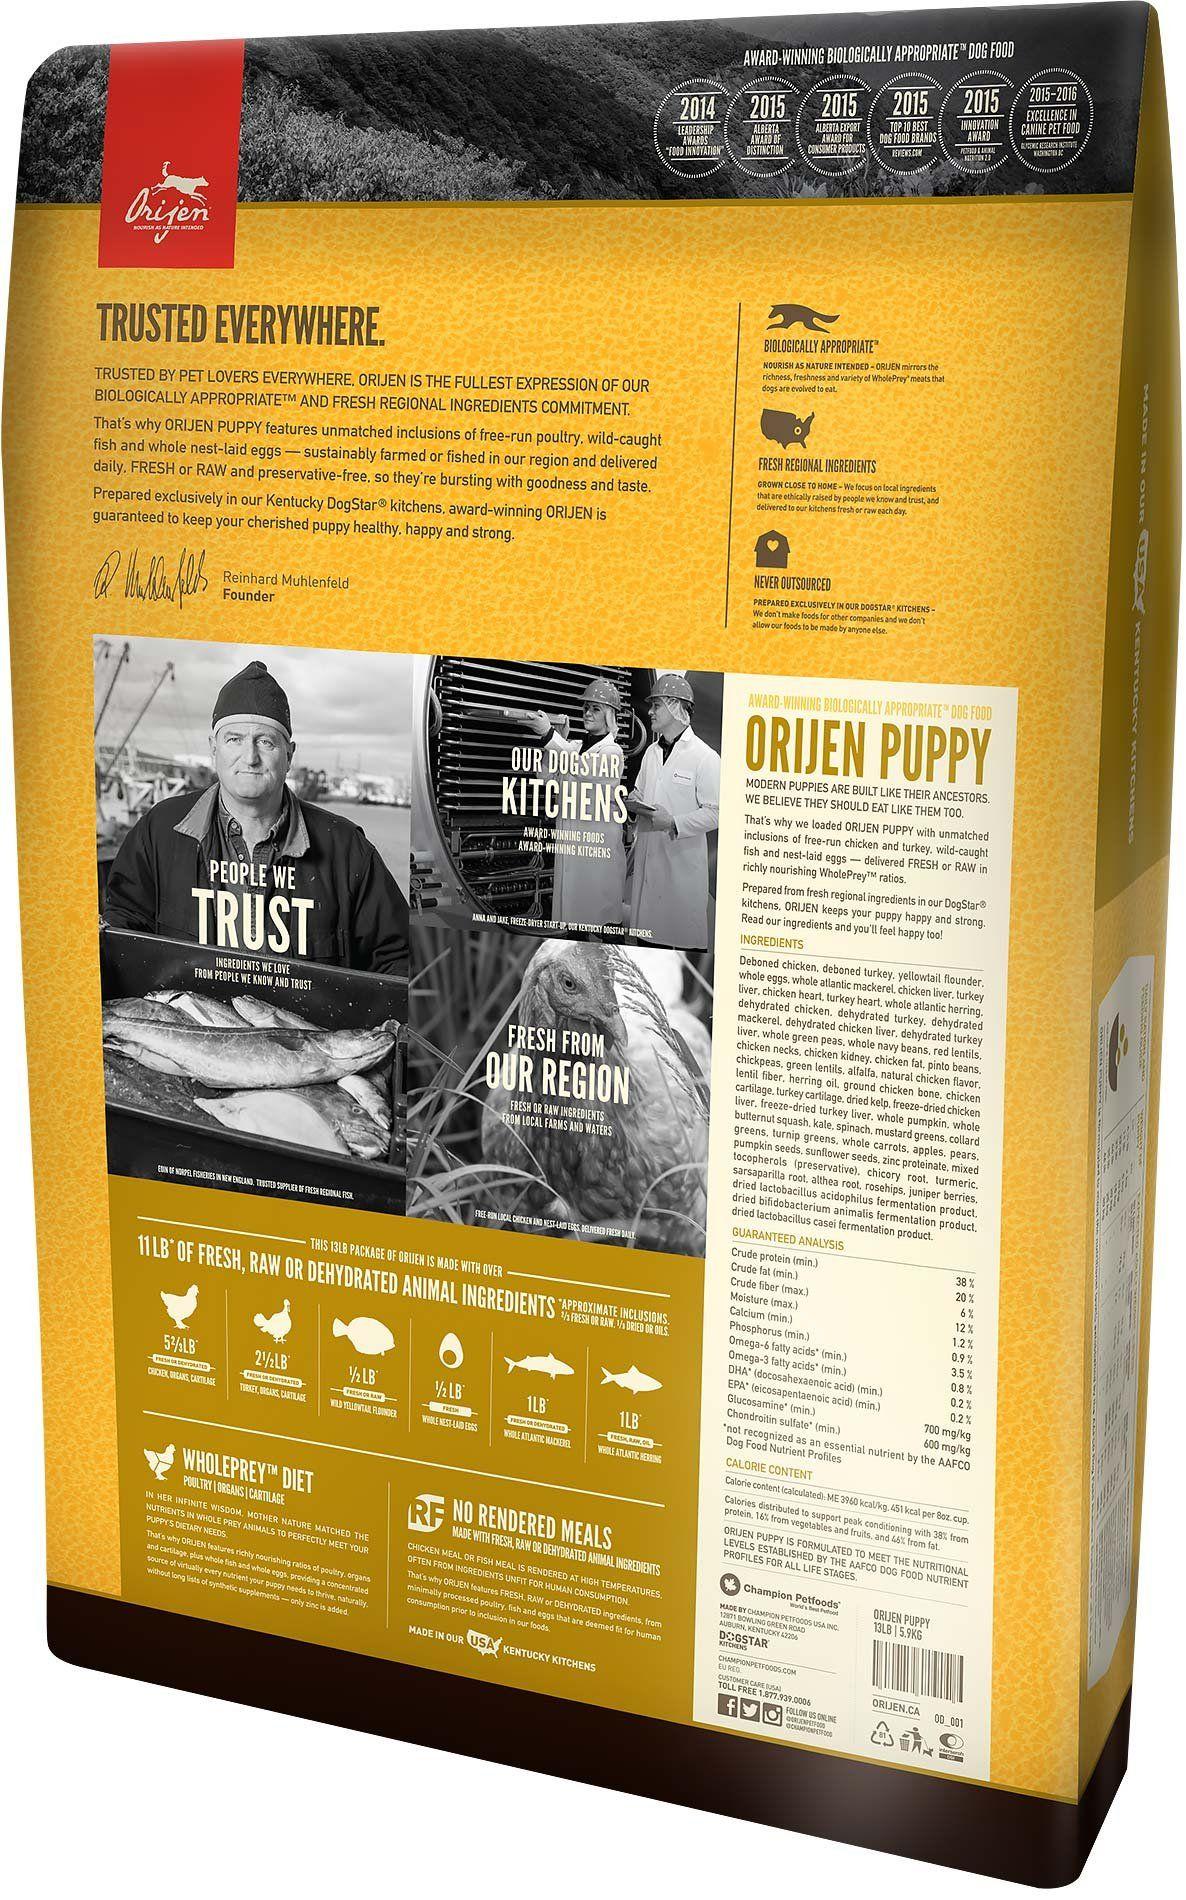 Orijen Puppy Formula 13 Lb You Can Discover Even More